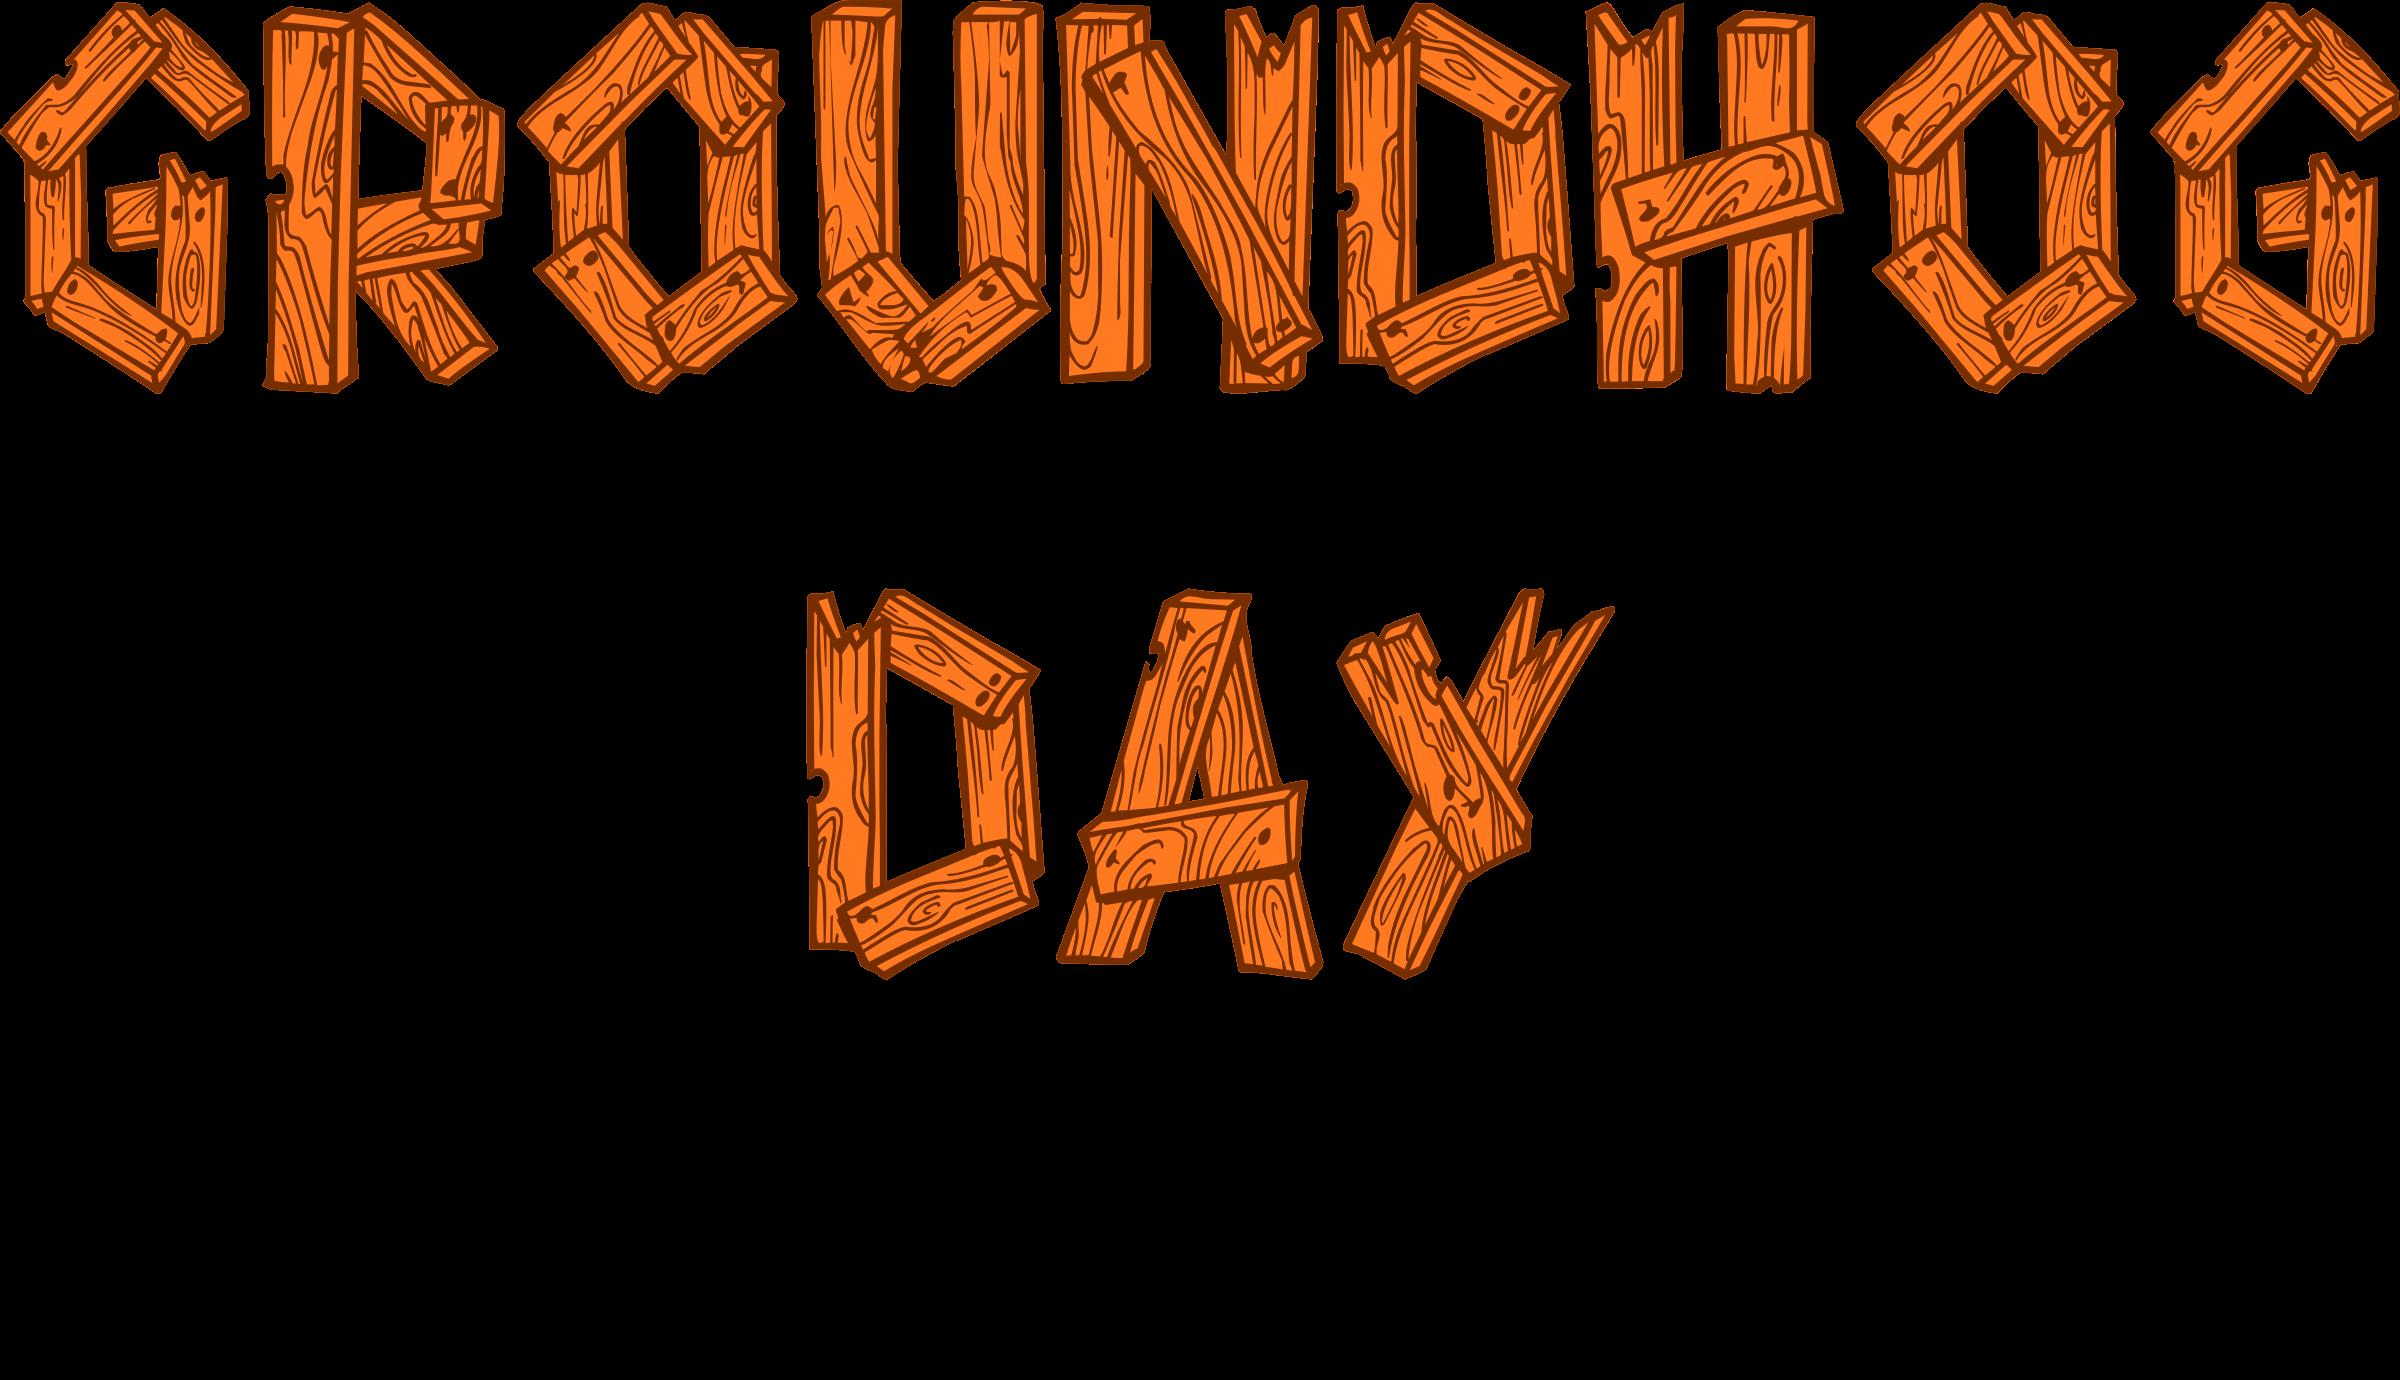 Groundhog clipart groundhog day. Sign